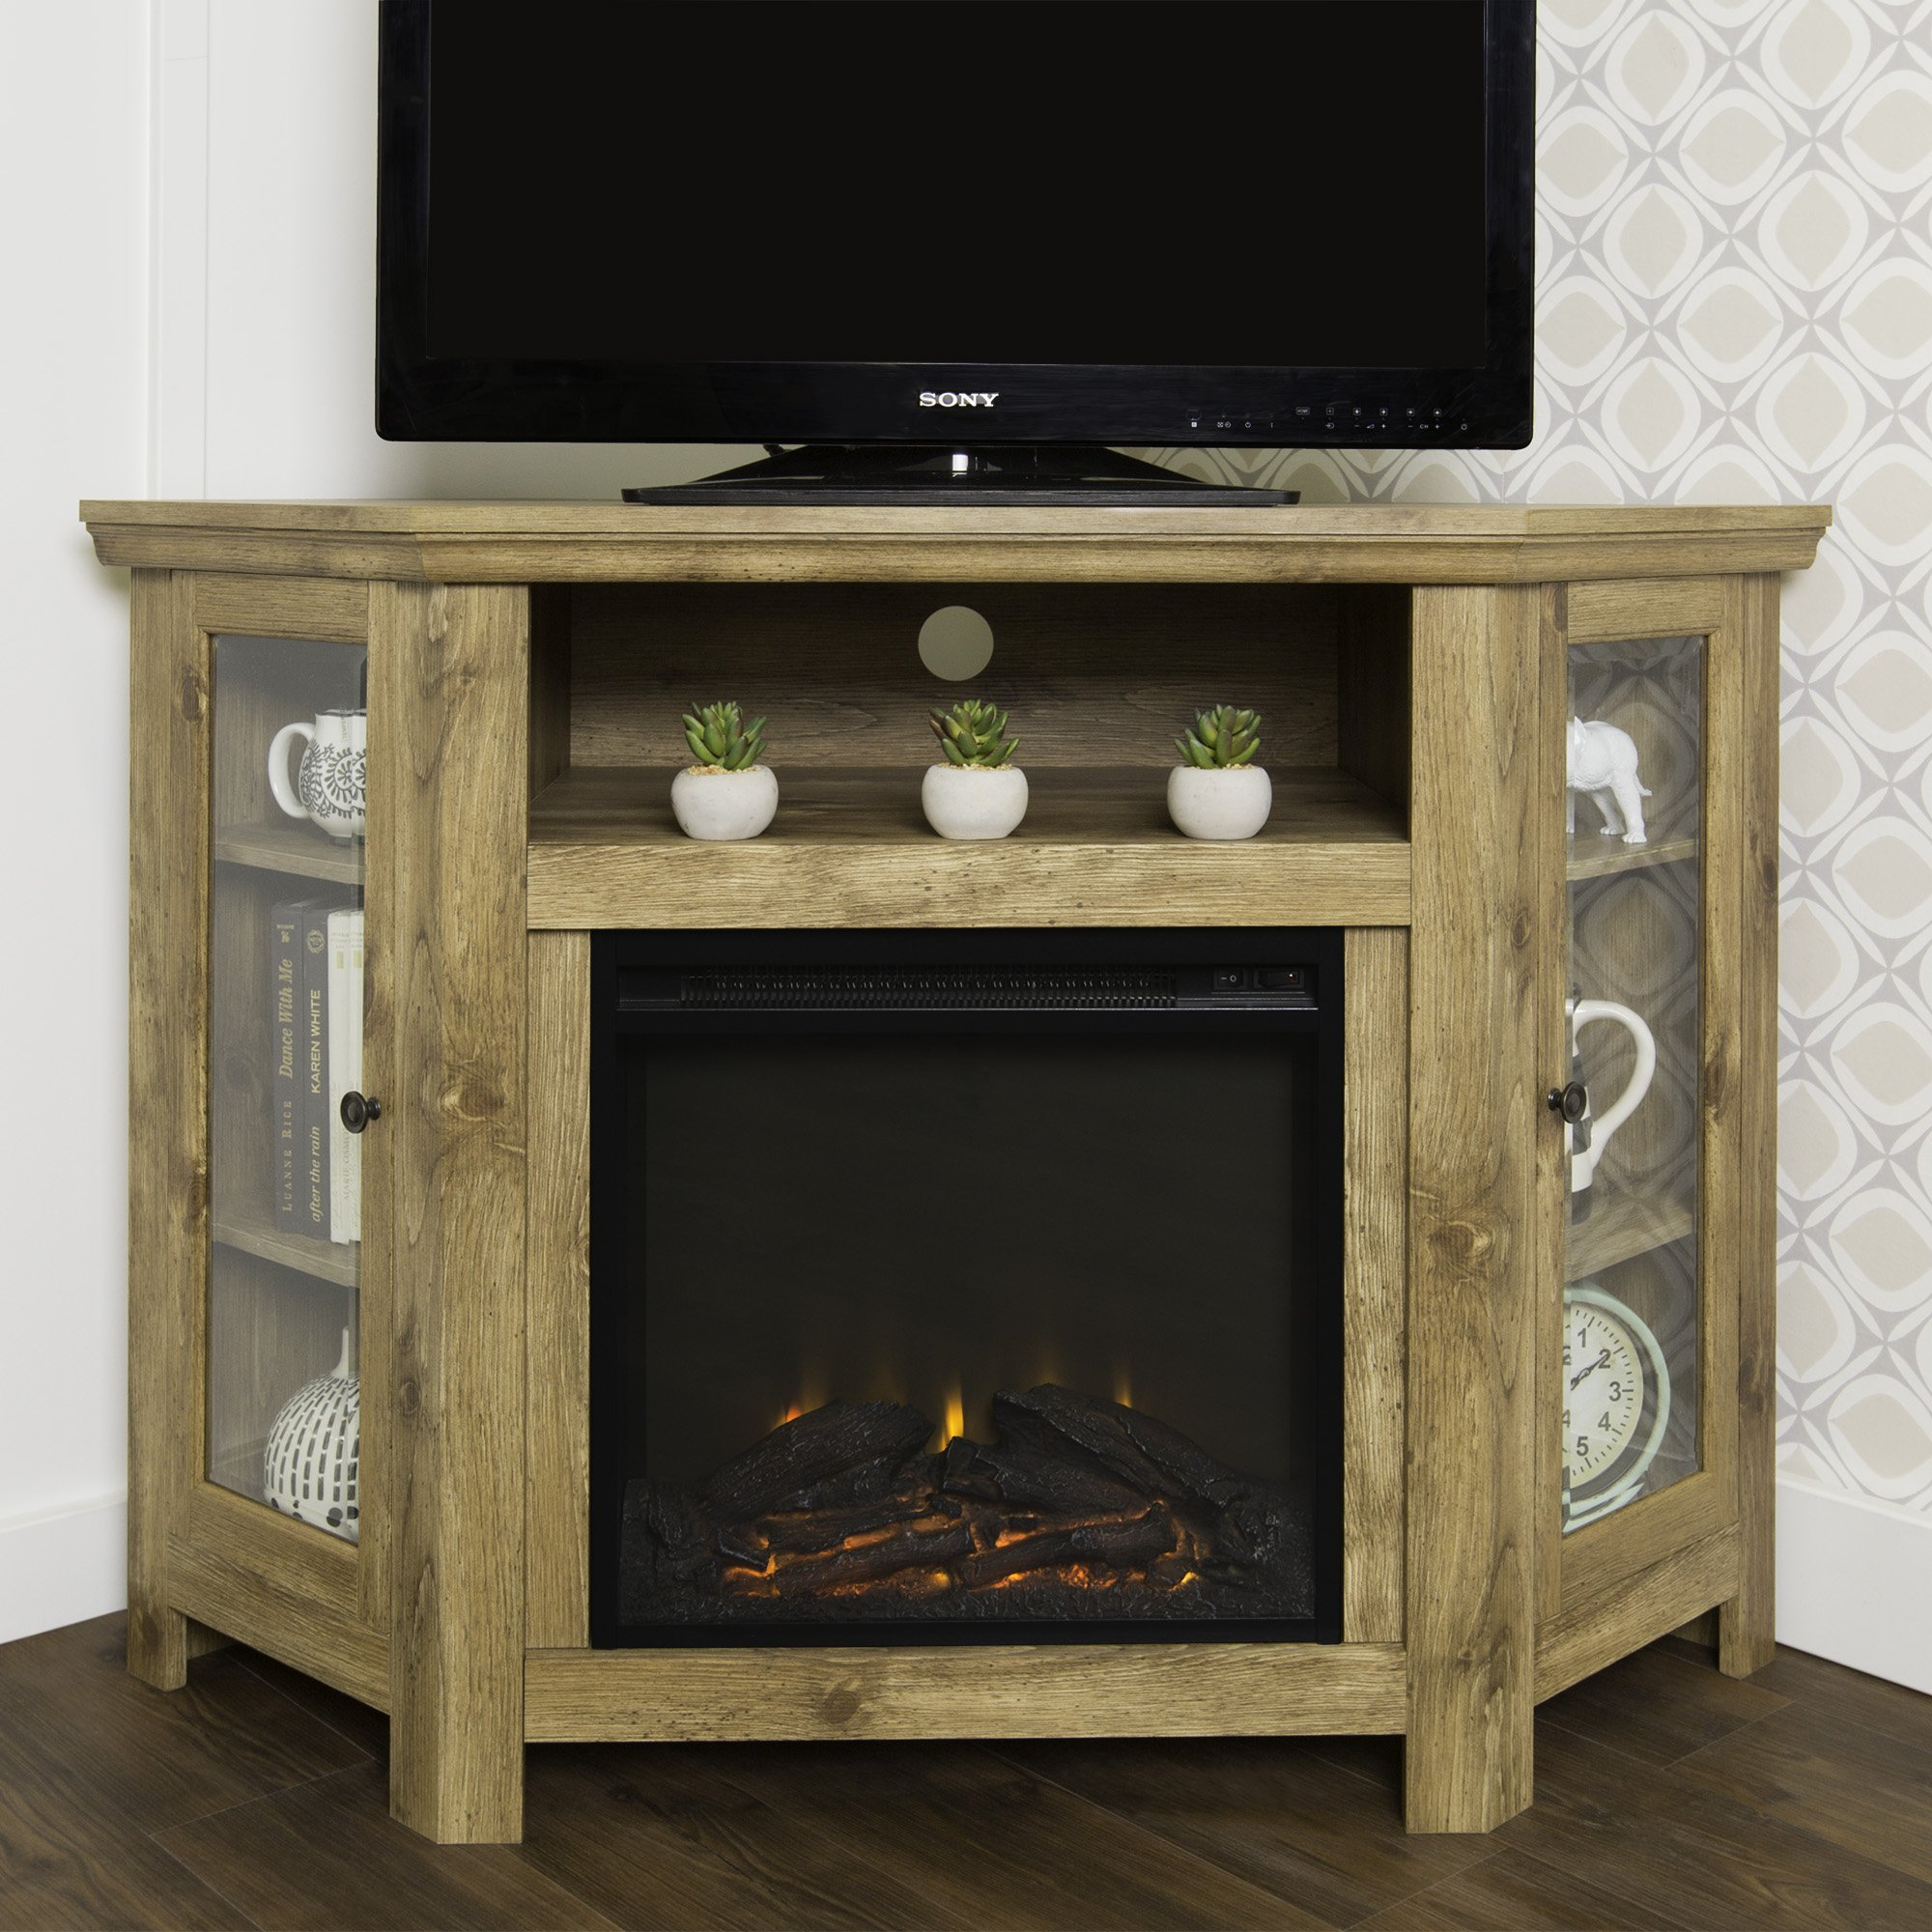 New 4 Foot Wide Fireplace TV Stand - Barnwood Finish-Corner Unit